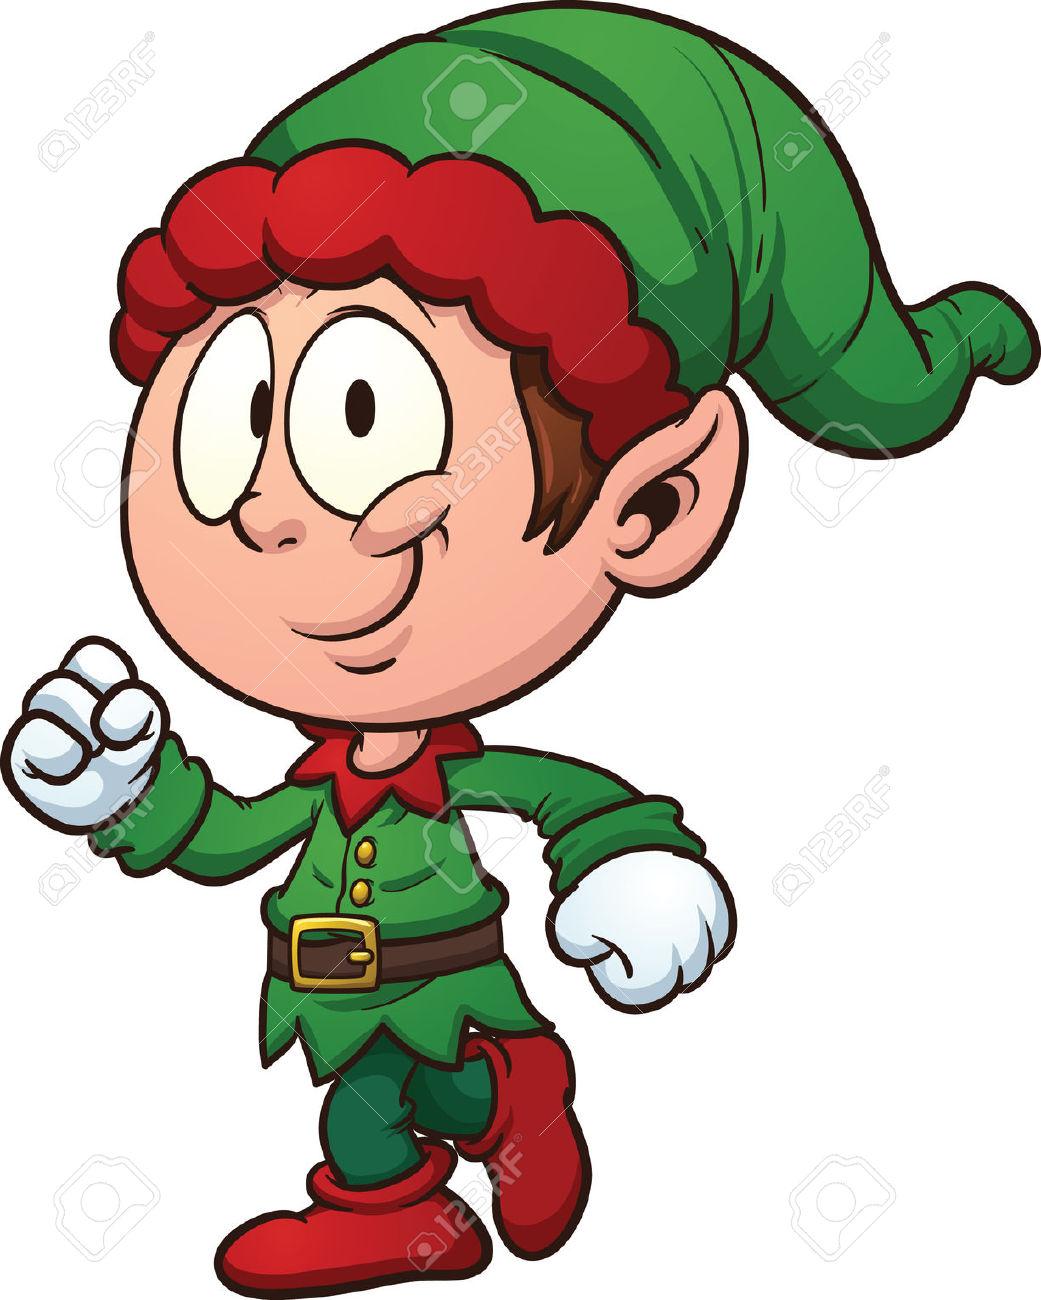 animated christmas elves clipart - Clipground